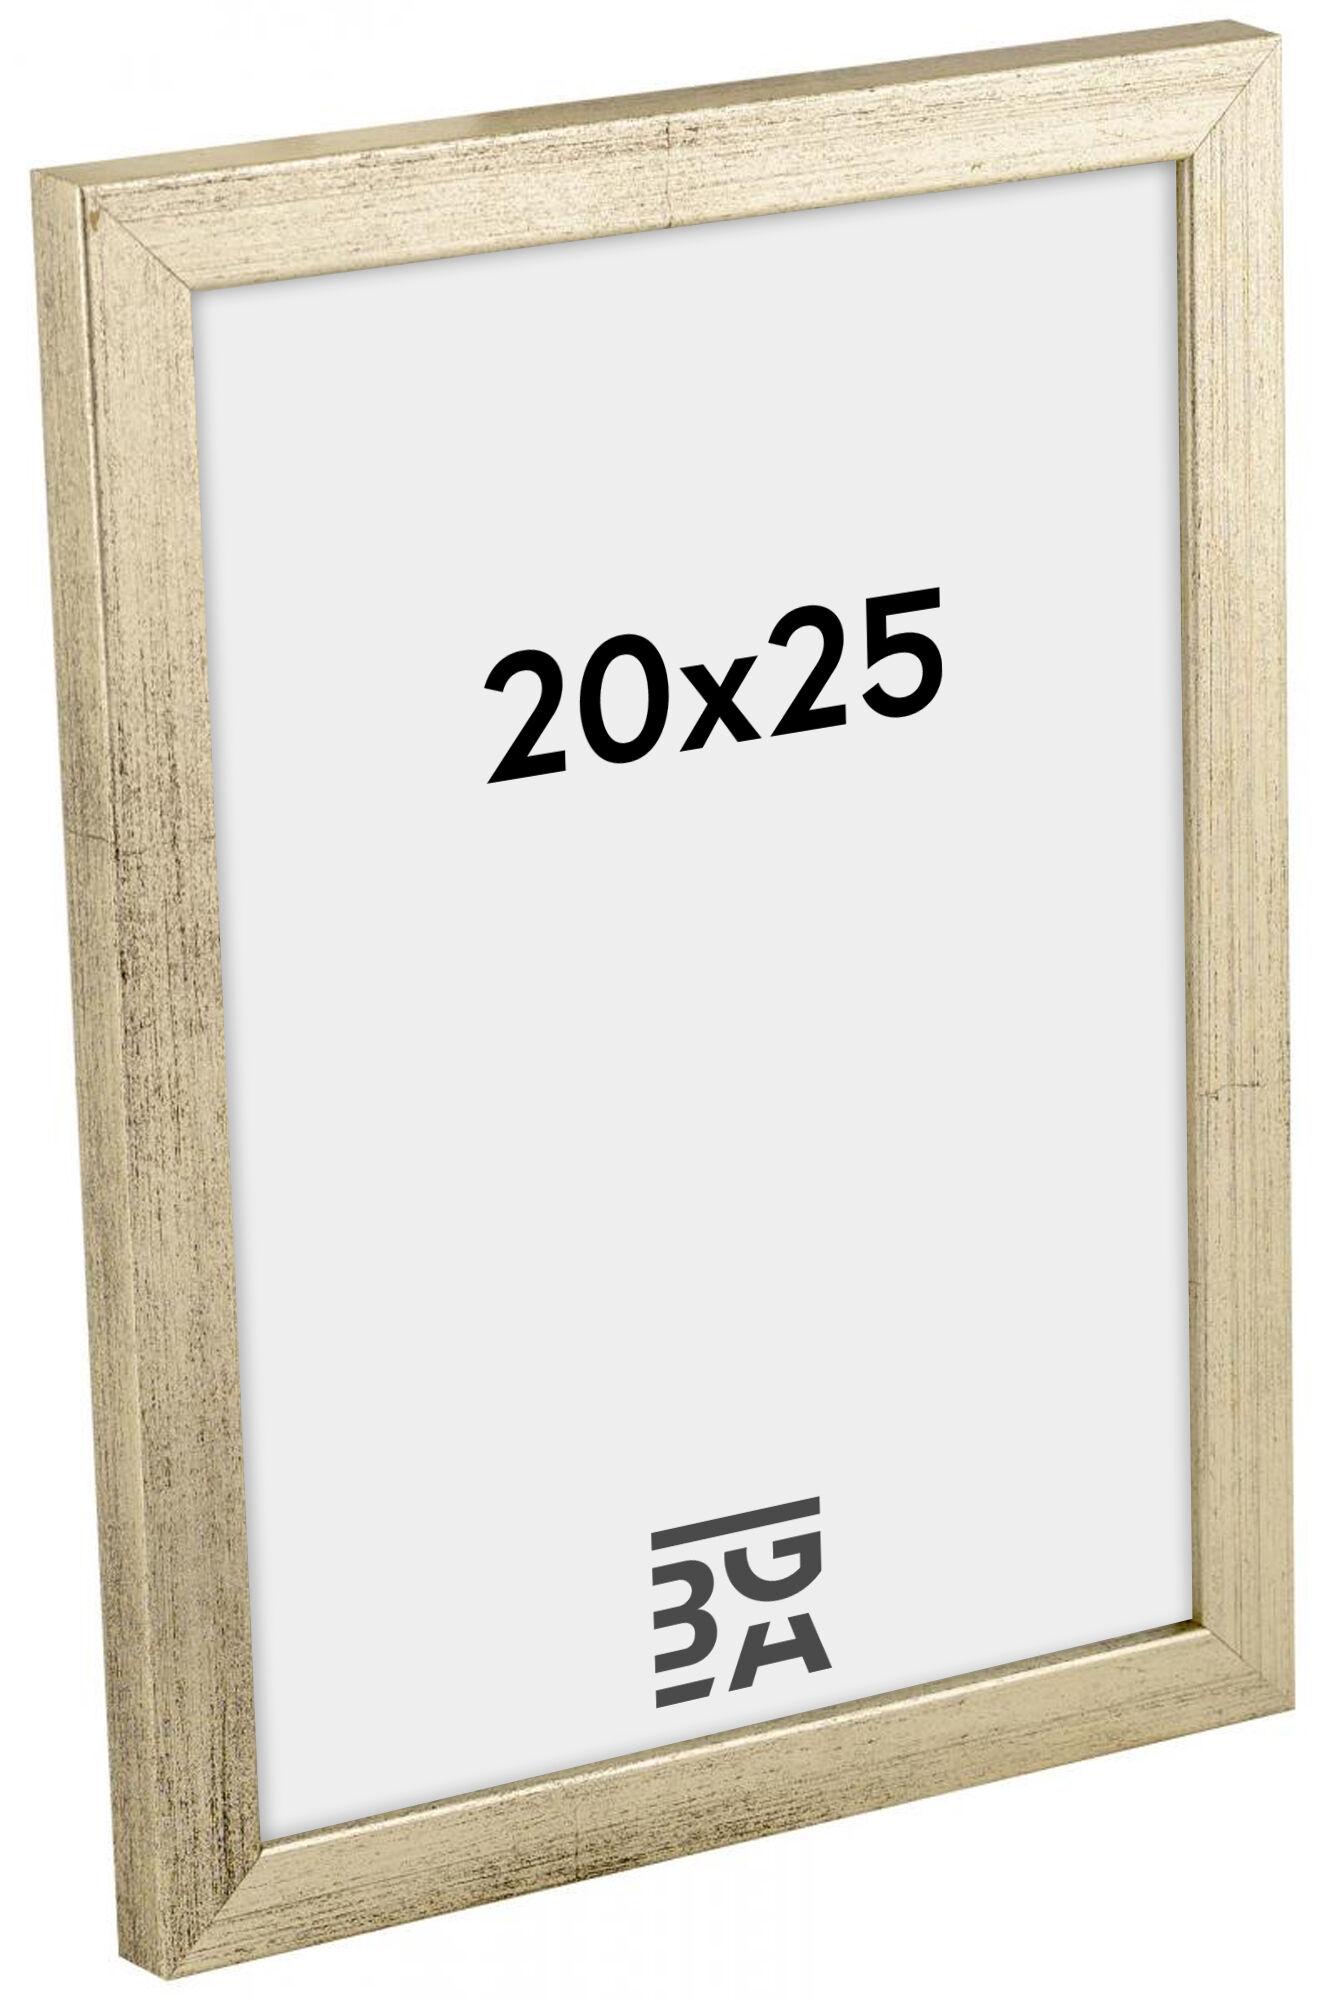 Estancia Galant Hopeanvärinen 20x25 cm